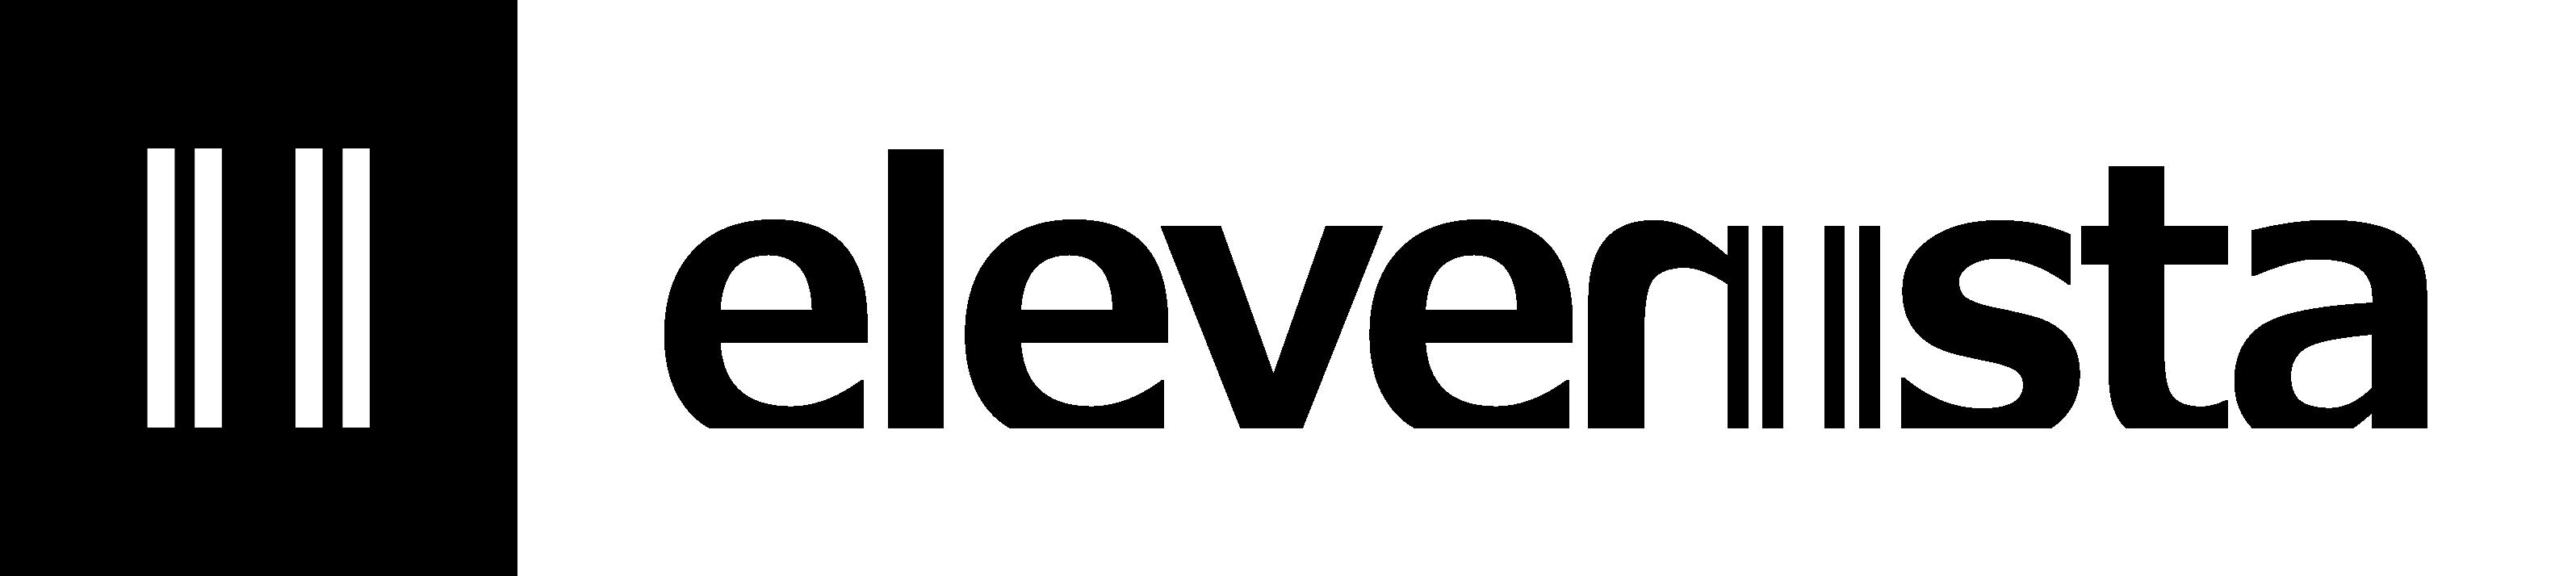 elevenista